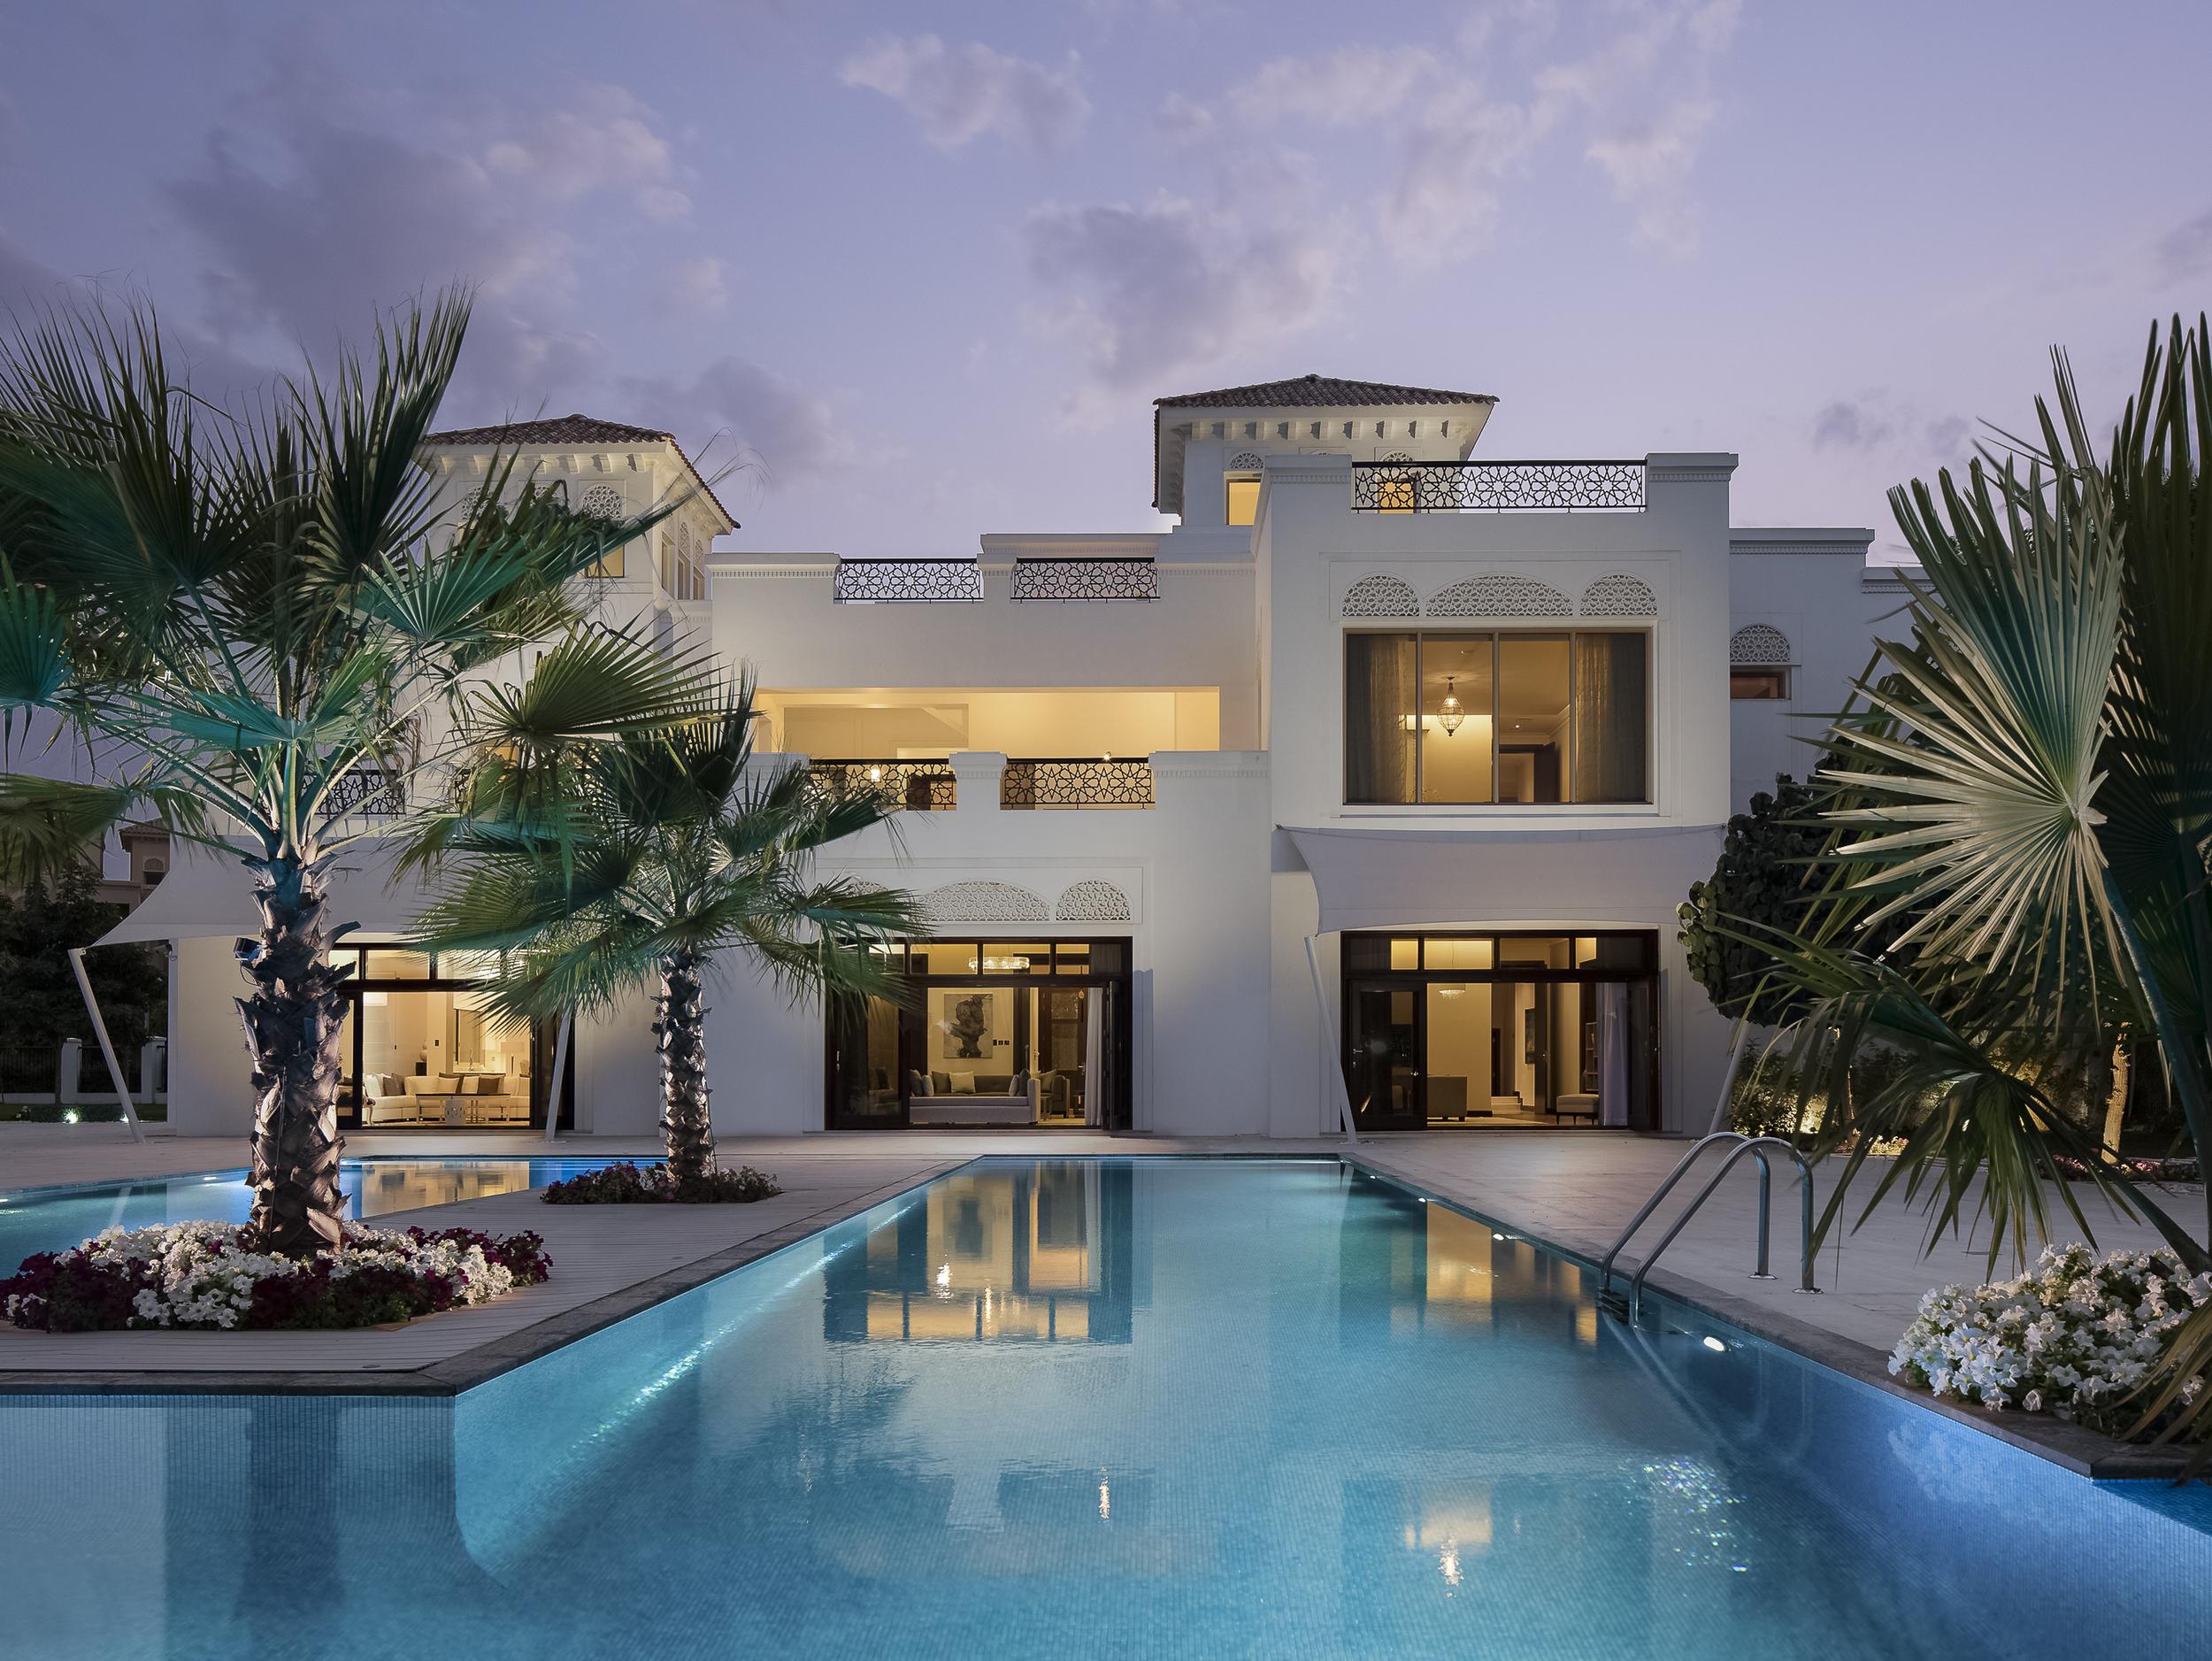 Dubai-GabeBorder-Architecture (1 of 1)-3.jpg